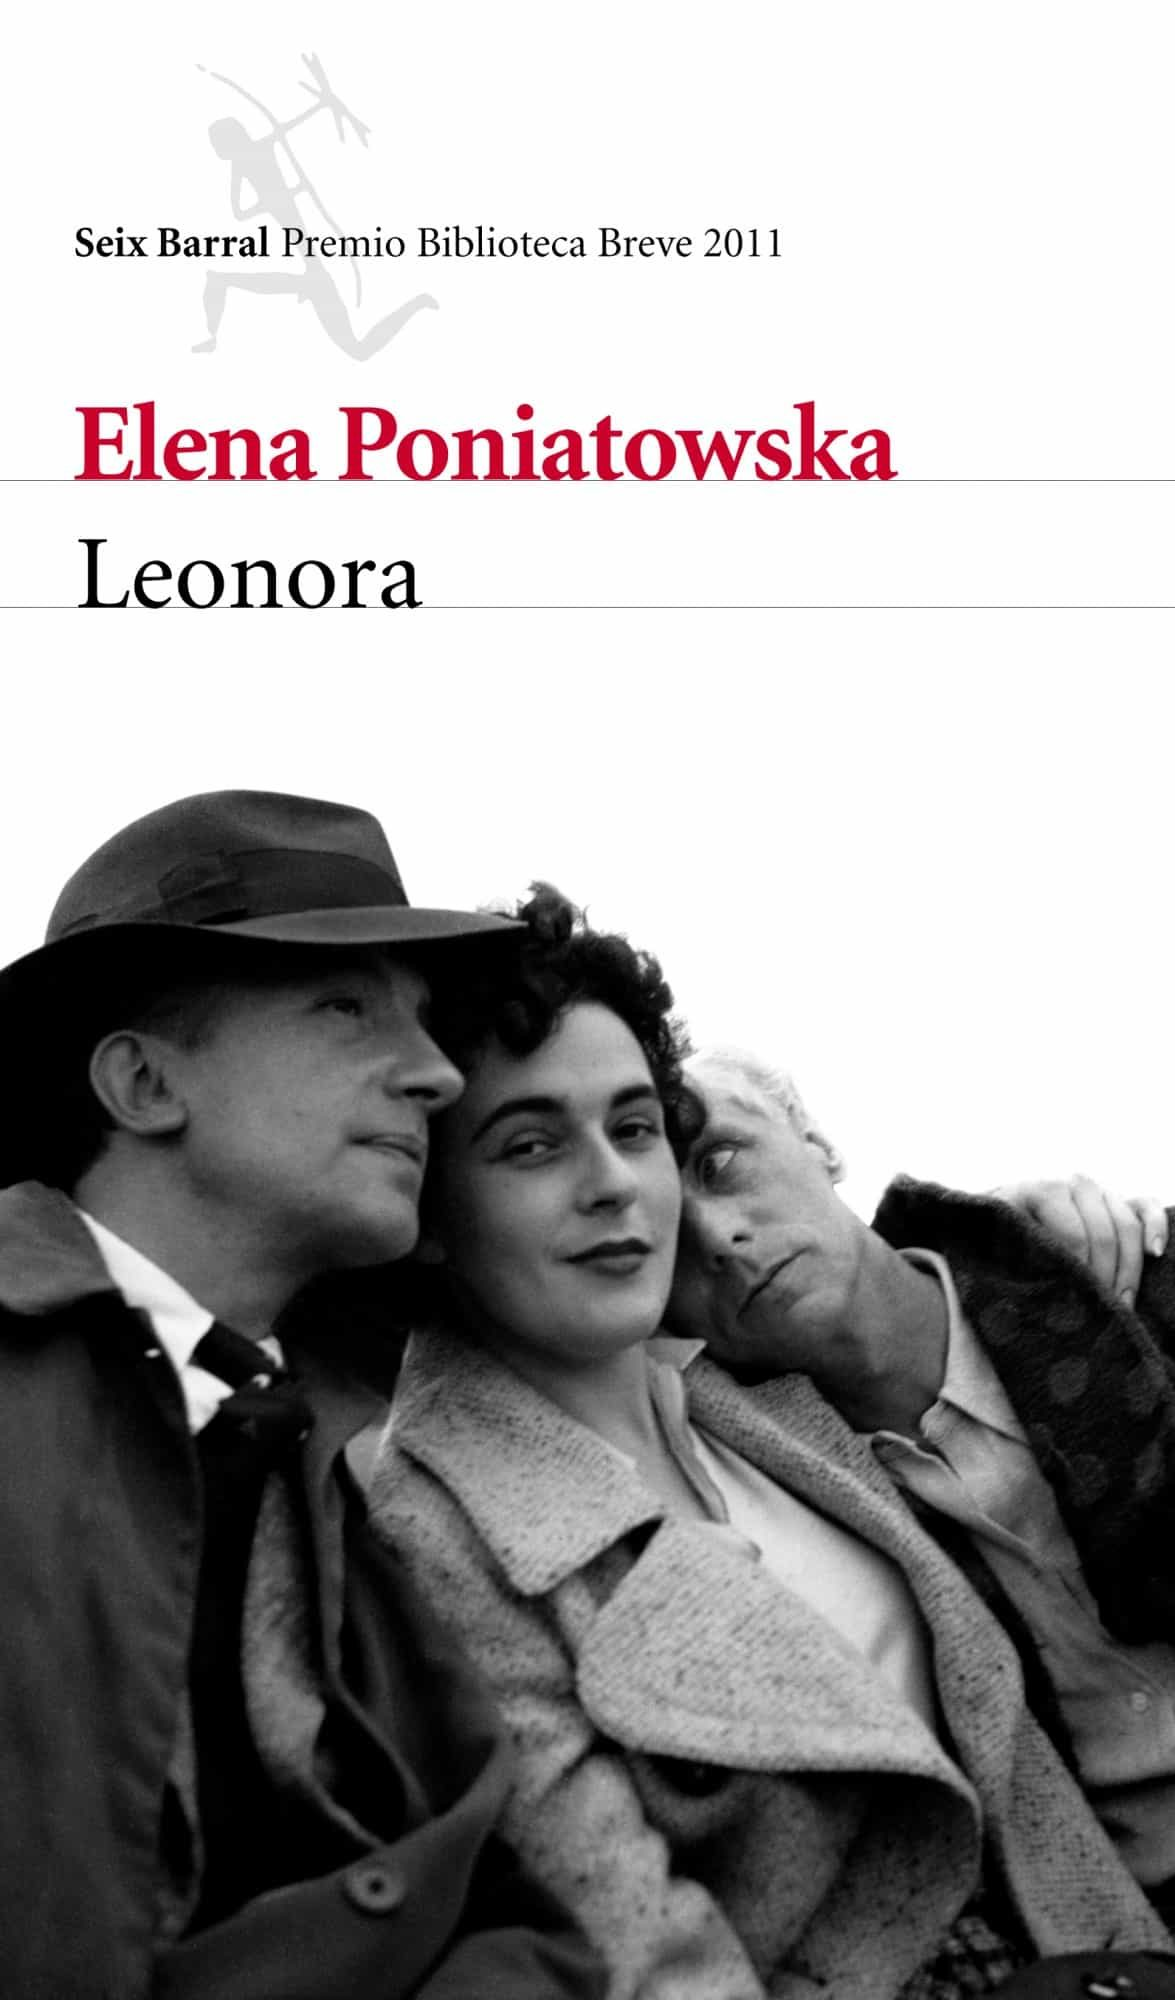 leonora (premio biblioteca breve 2011)-elena poniatowska-9788432214035